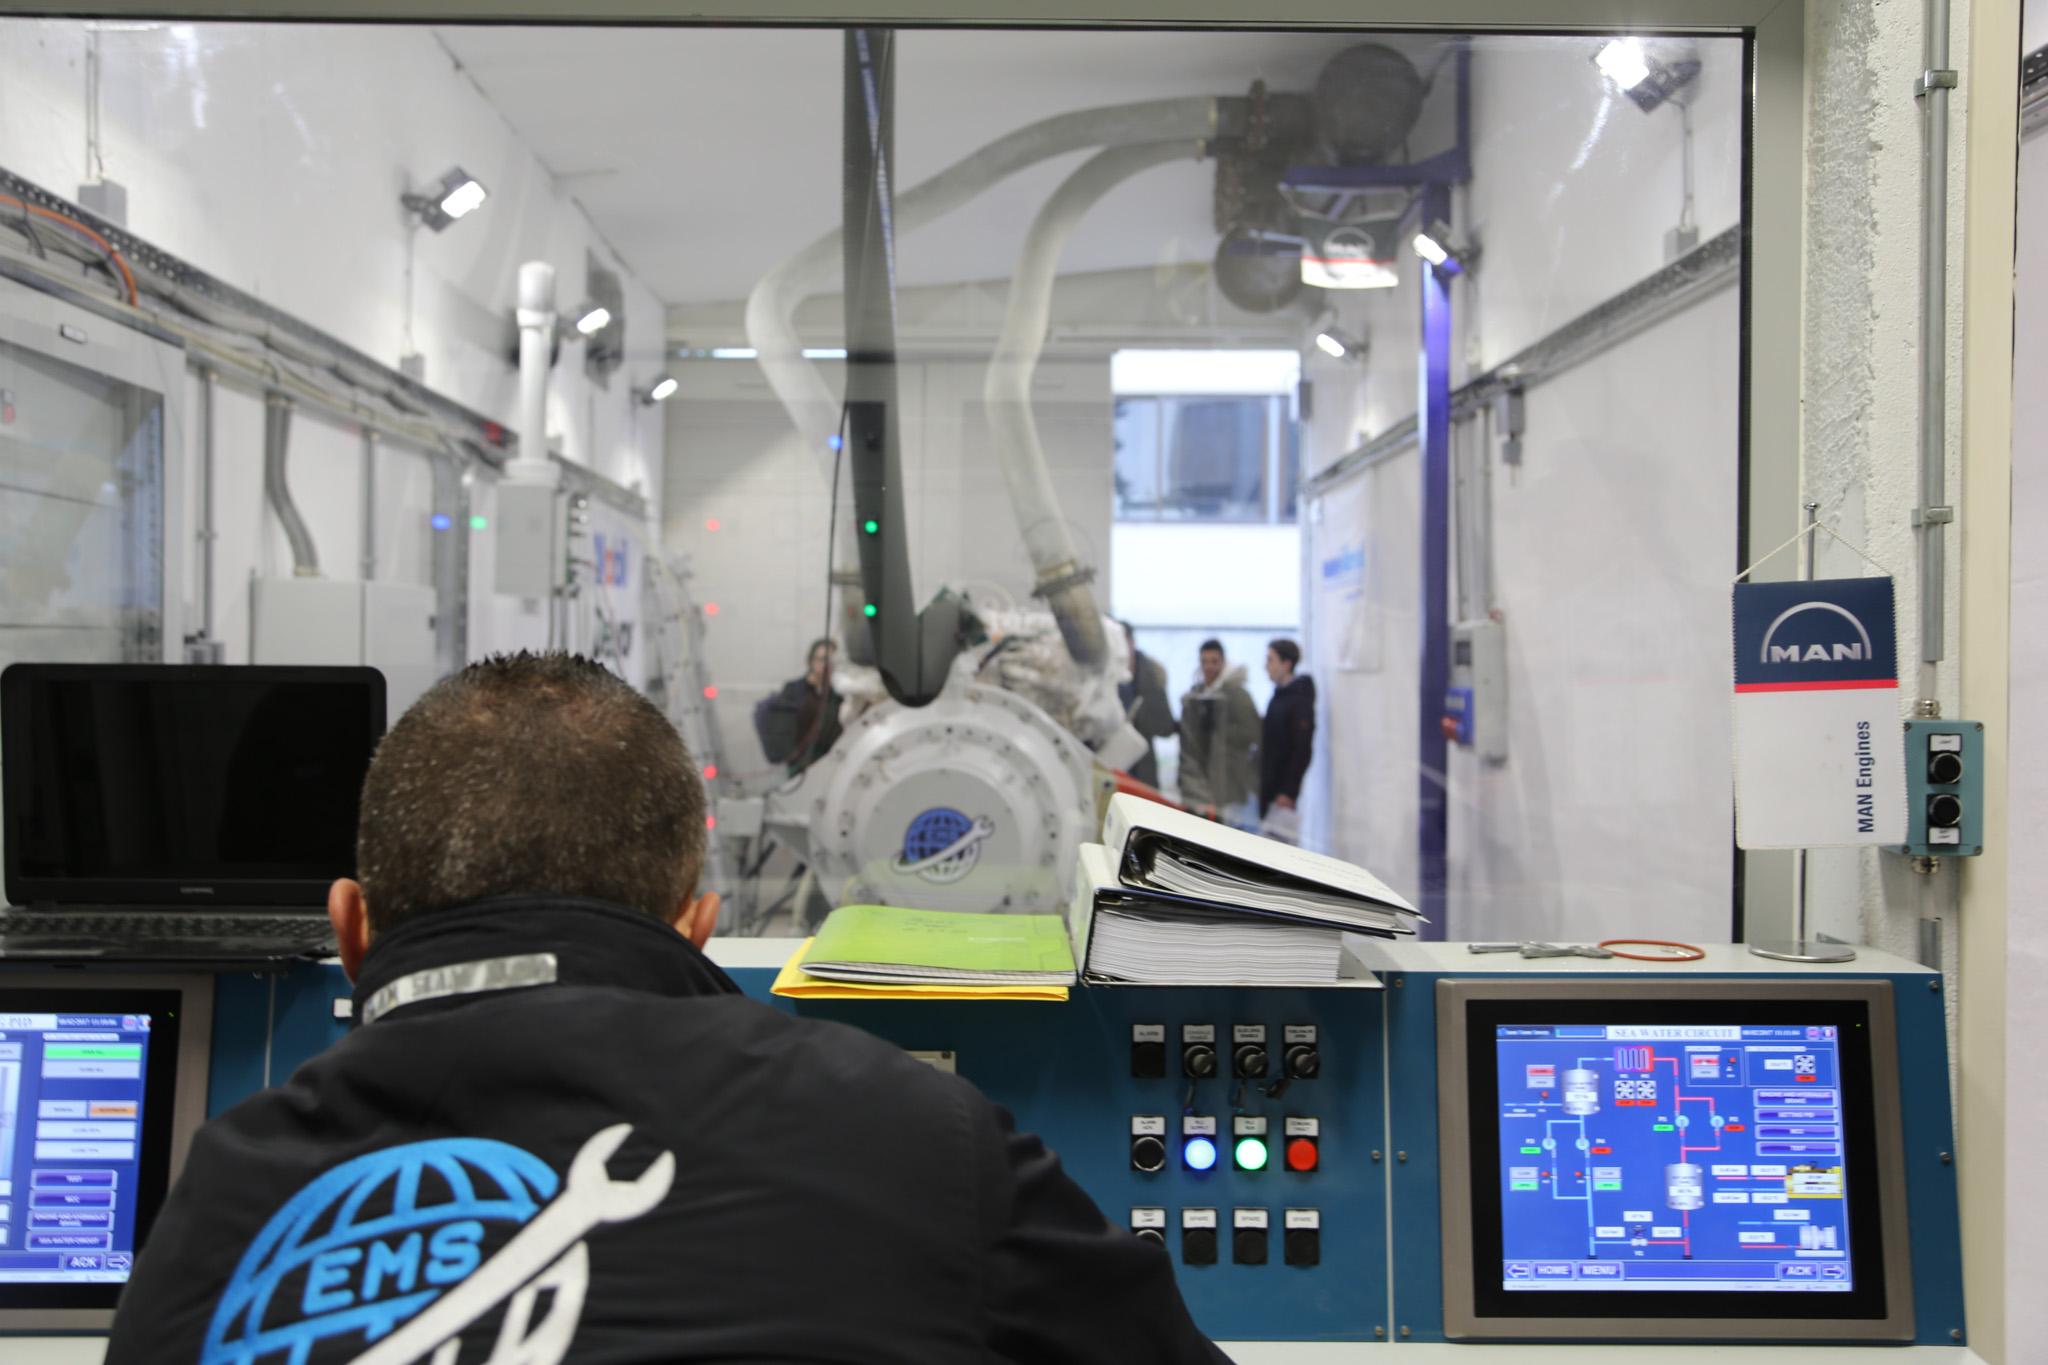 banc d u2019essai moteurs    test bench  u2013 engine marine services